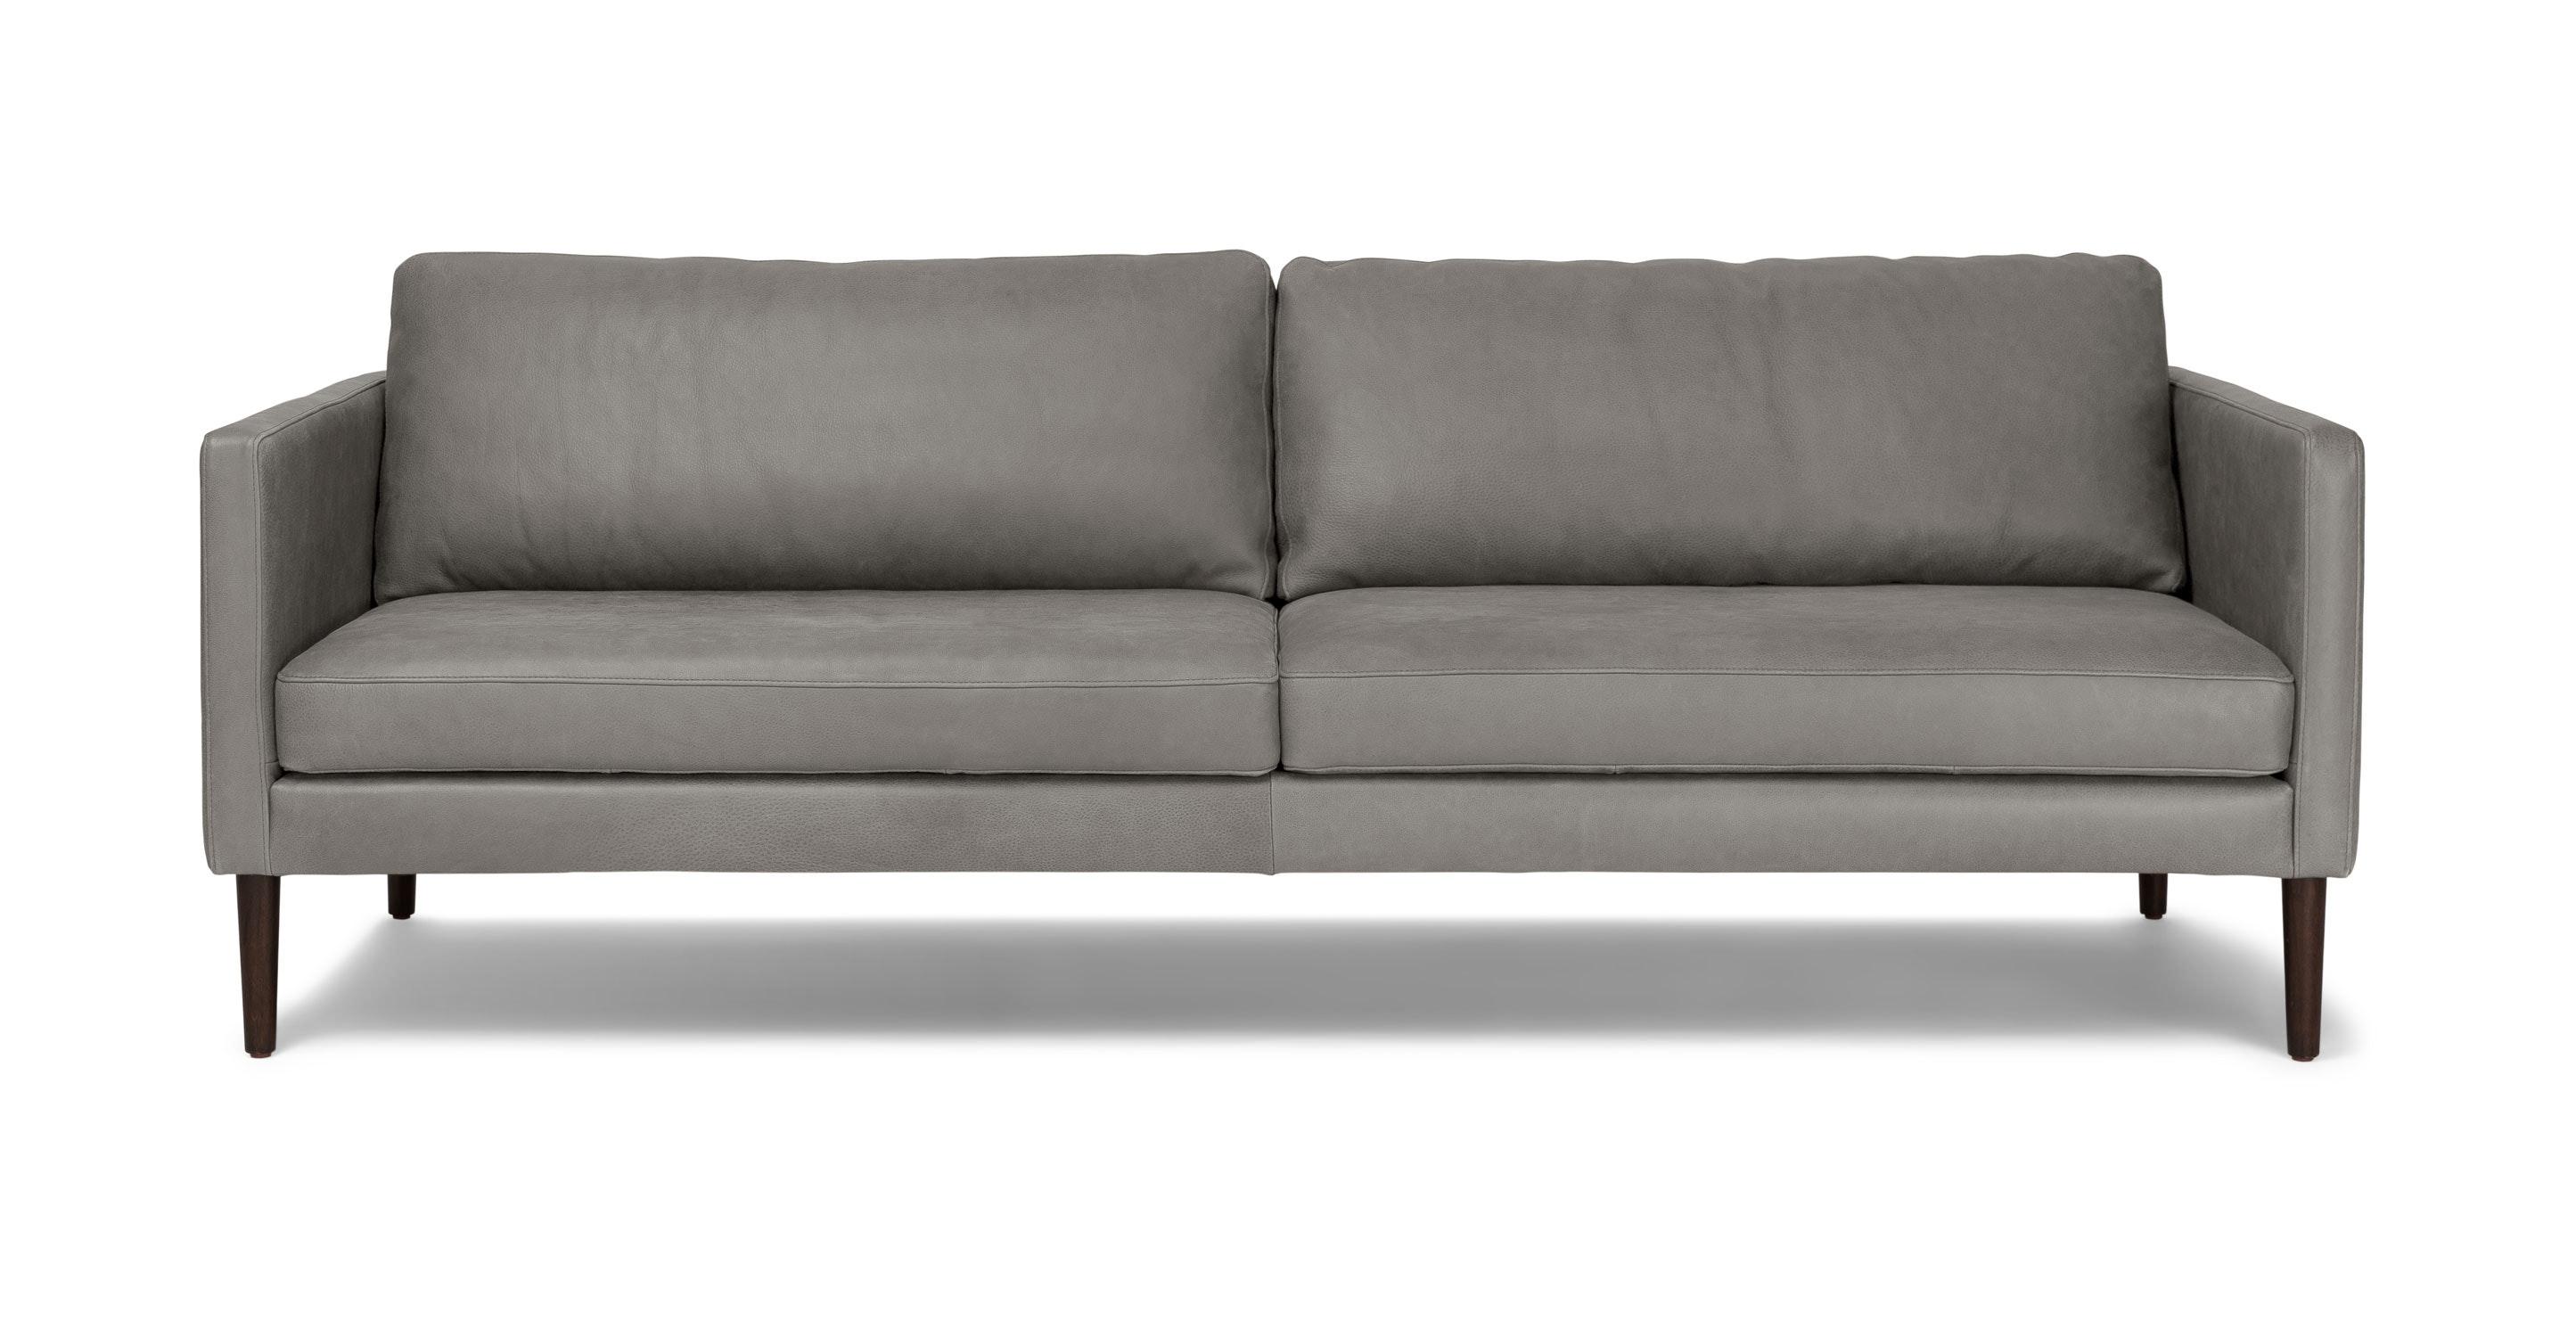 Echo Primo Lichen Gray Sofa Sofas Article Modern Mid Century And Scandinavian Furniture